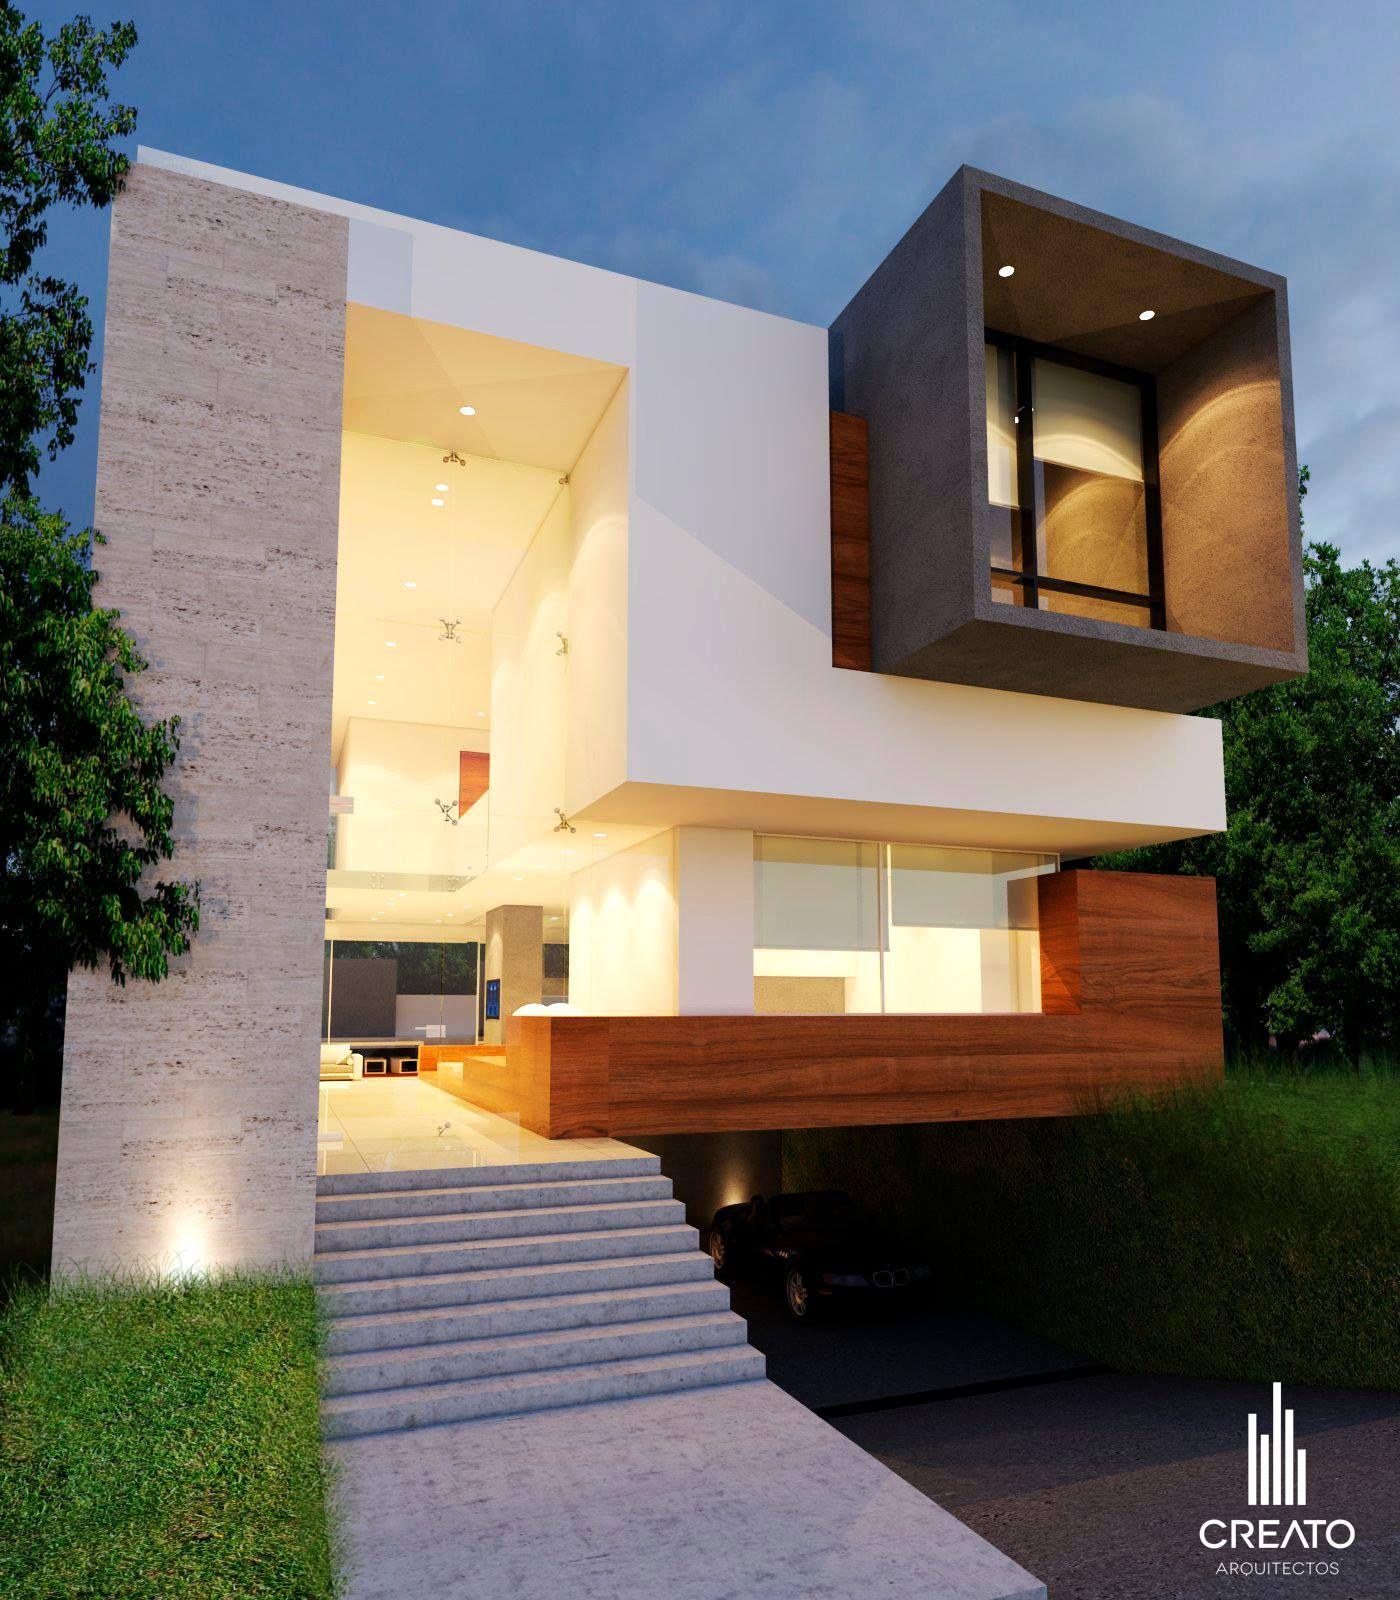 Cubo madera concreto v llalar pinterest cubos for Casas modernas residenciales